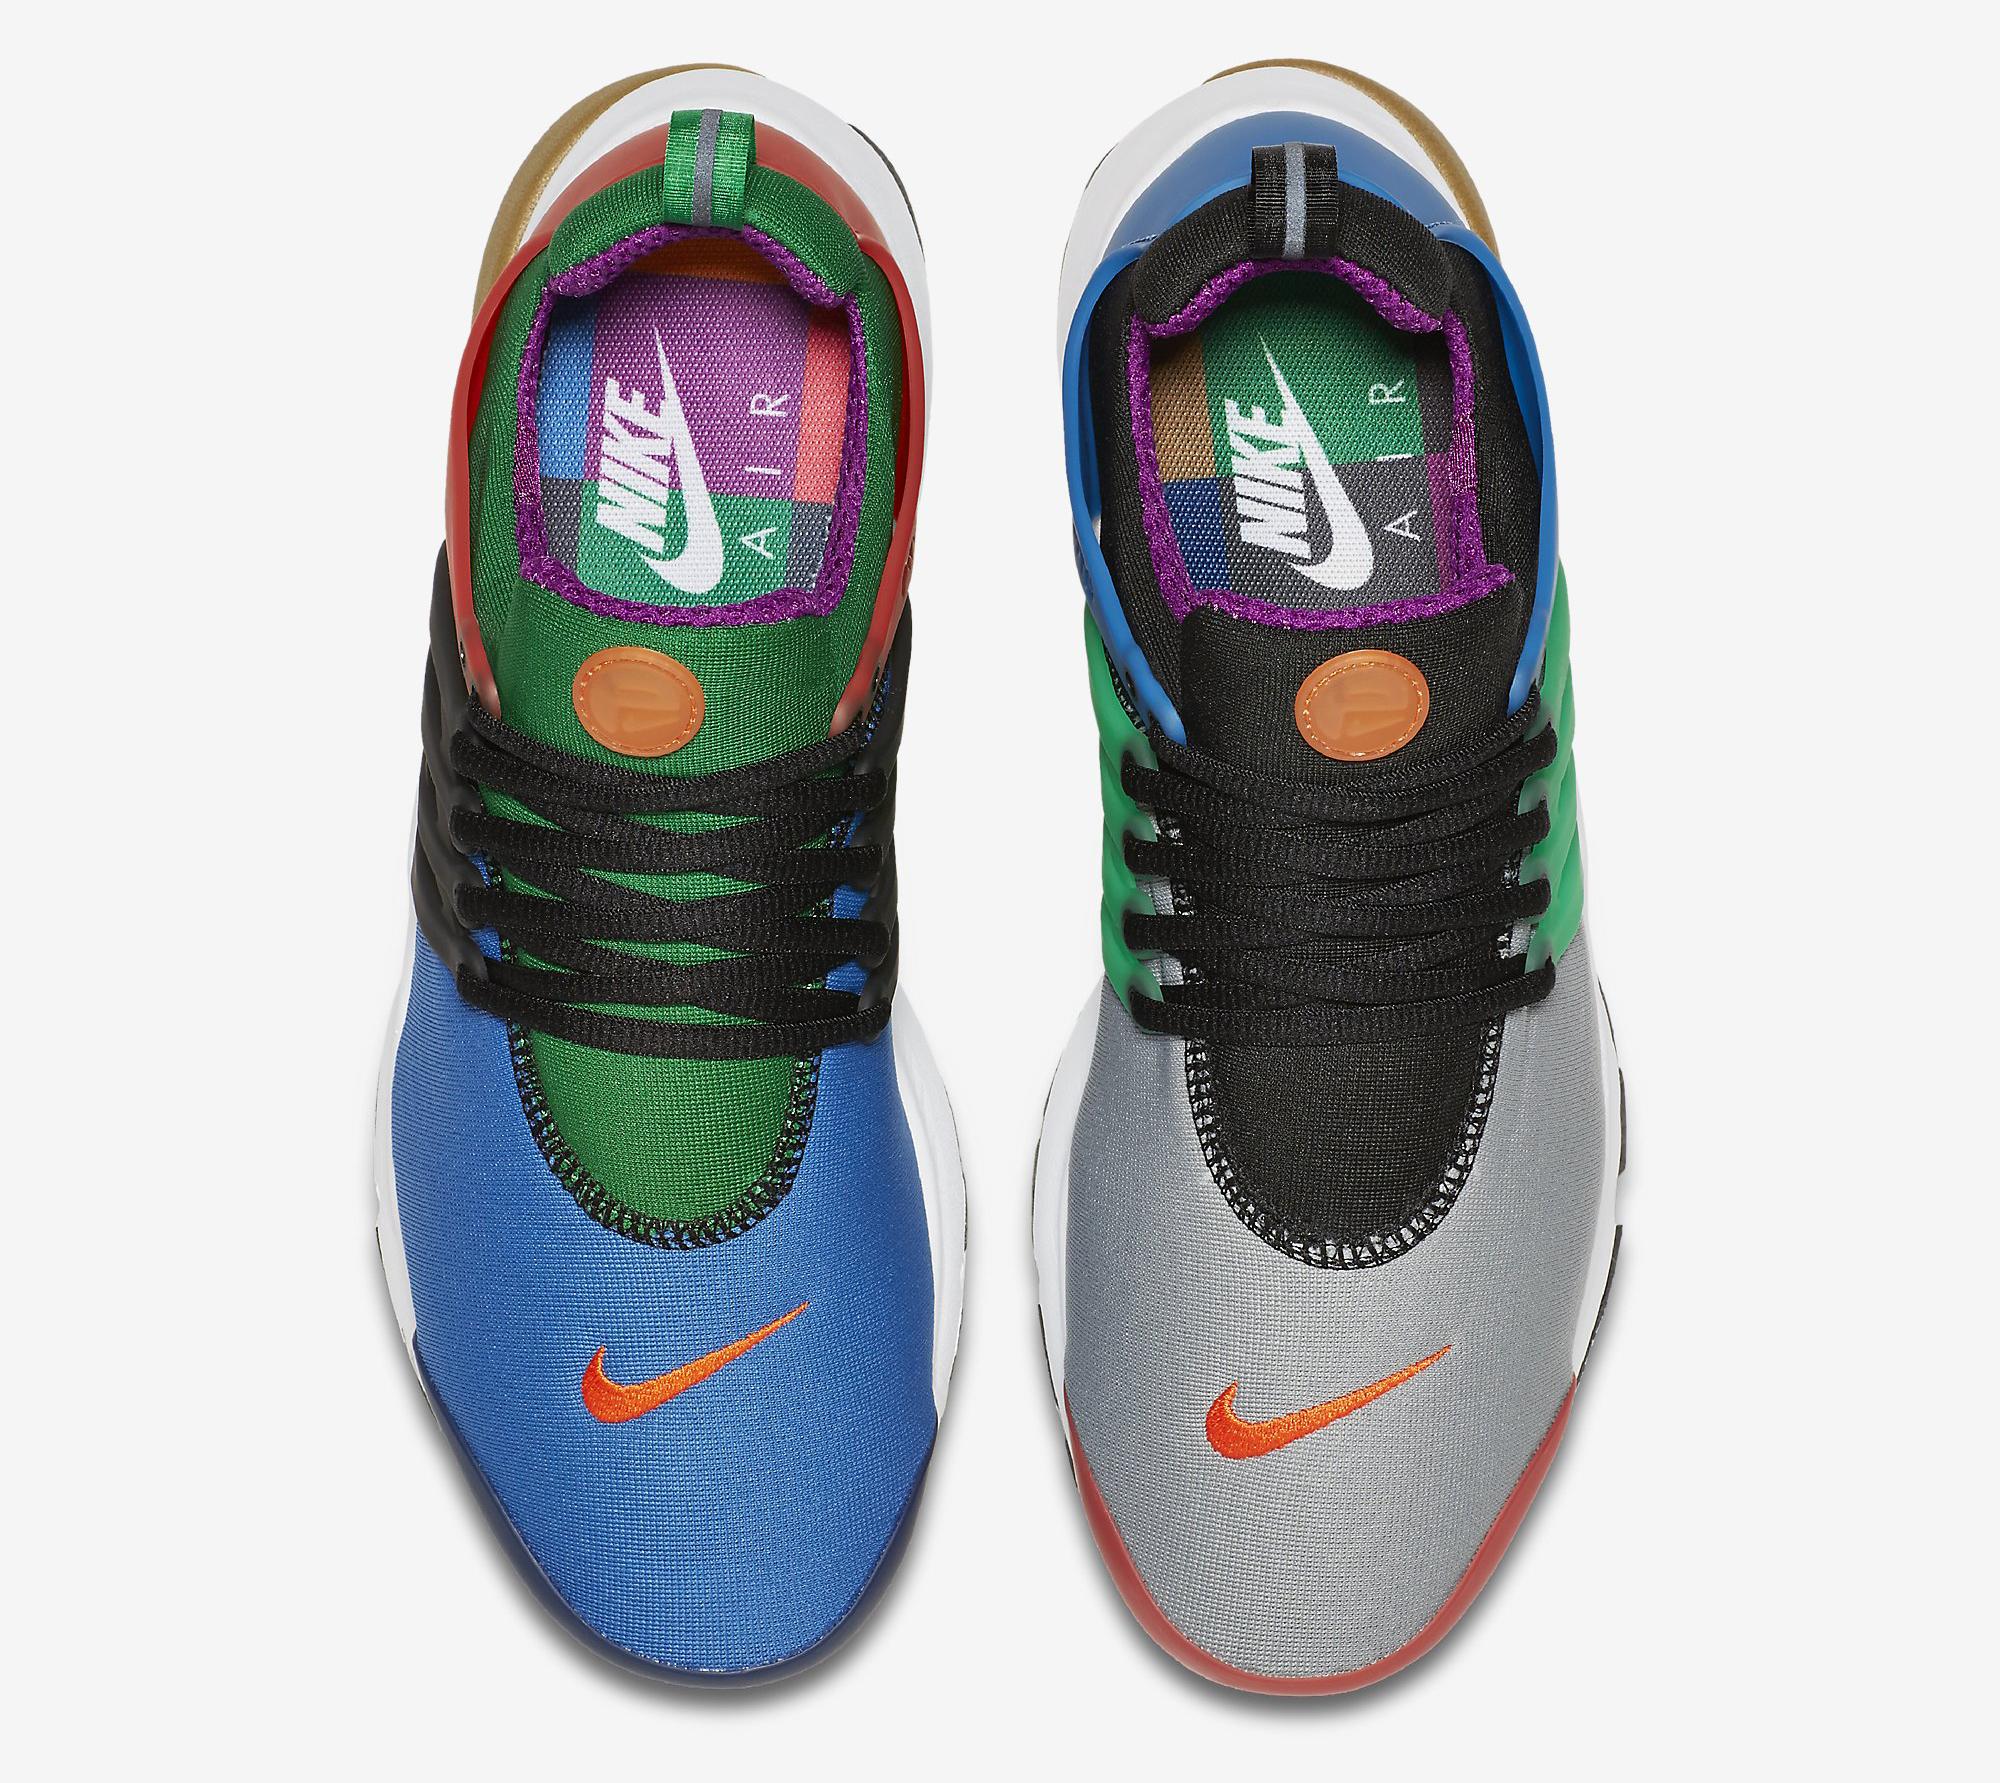 Nike Air Presto Greedy 886043-400